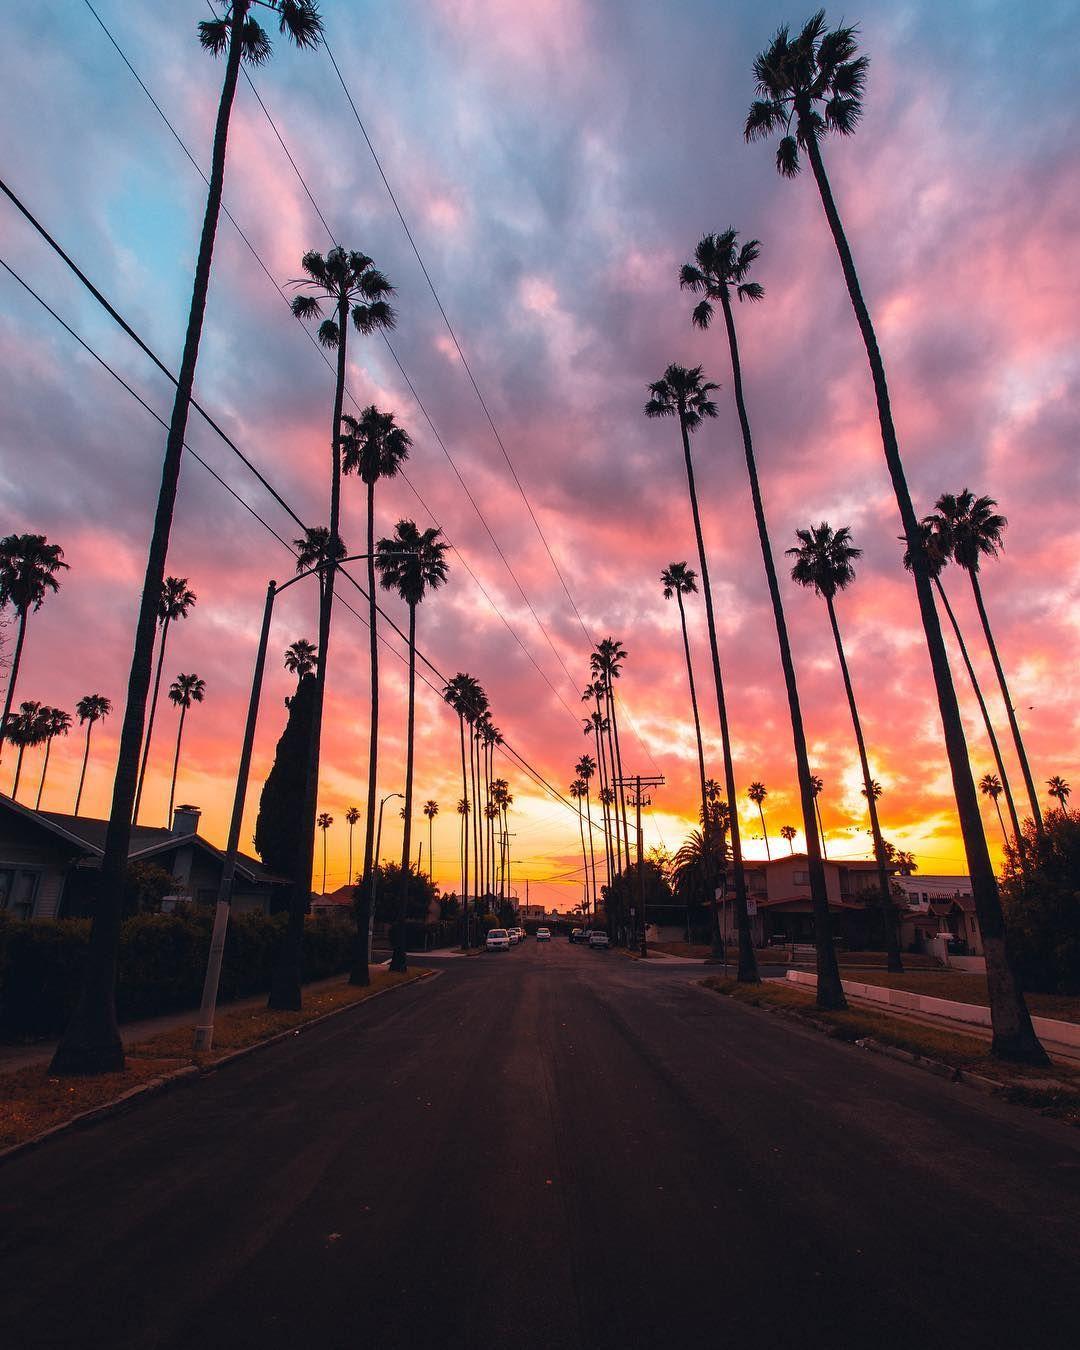 LA, California Cute iphone wallpaper tumblr